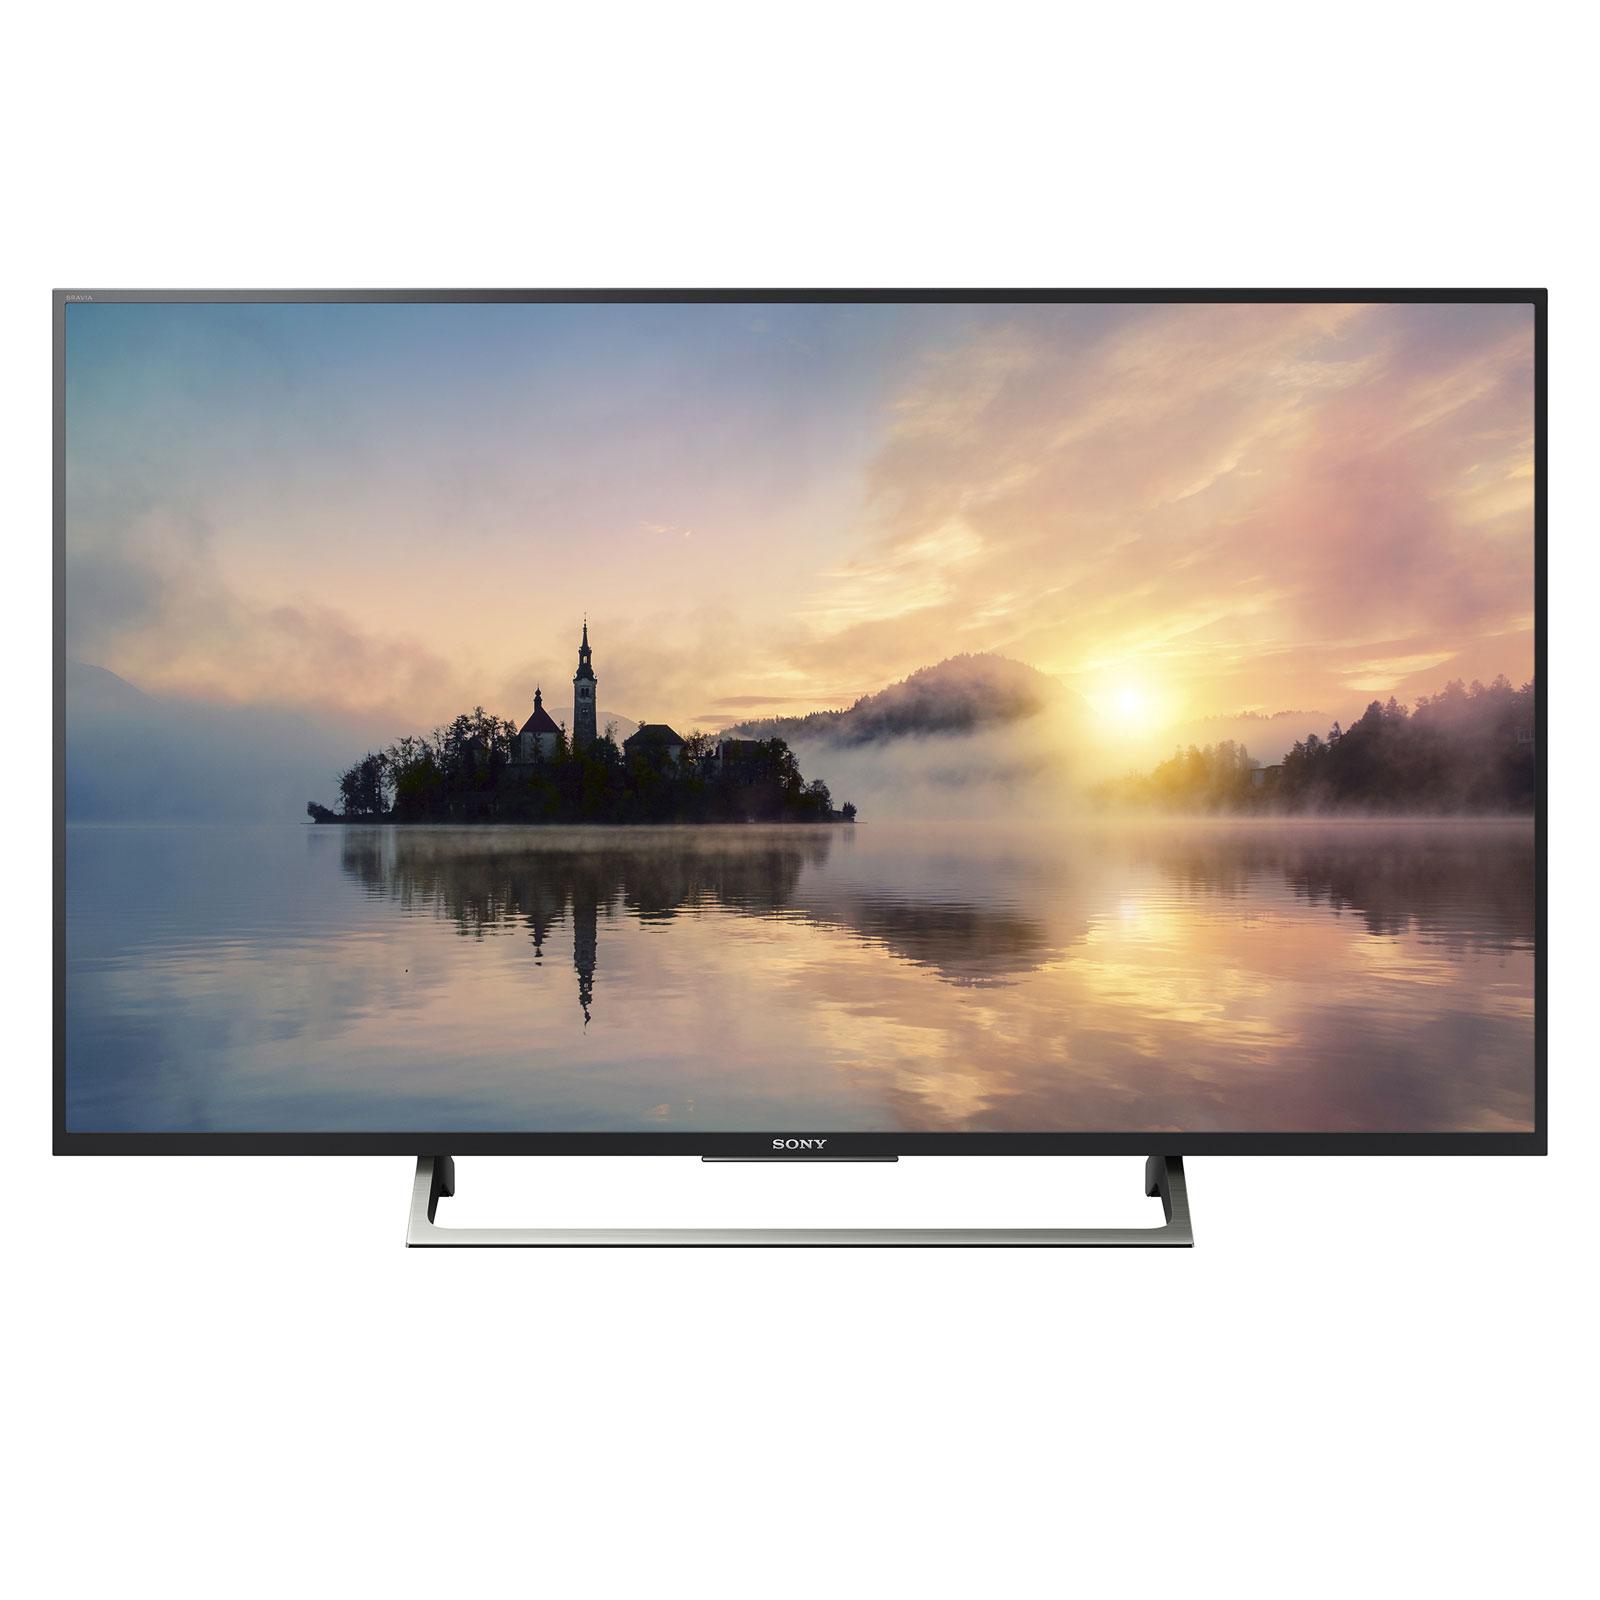 "TV Sony KD-55XE7005 Téléviseur LED 4K 55"" (140 cm) 16/9 - 3840 x 2160 pixels - TNT, Câble et Satellite HD - HDR - Ultra HD 2160p - Wi-Fi - 200 Hz"